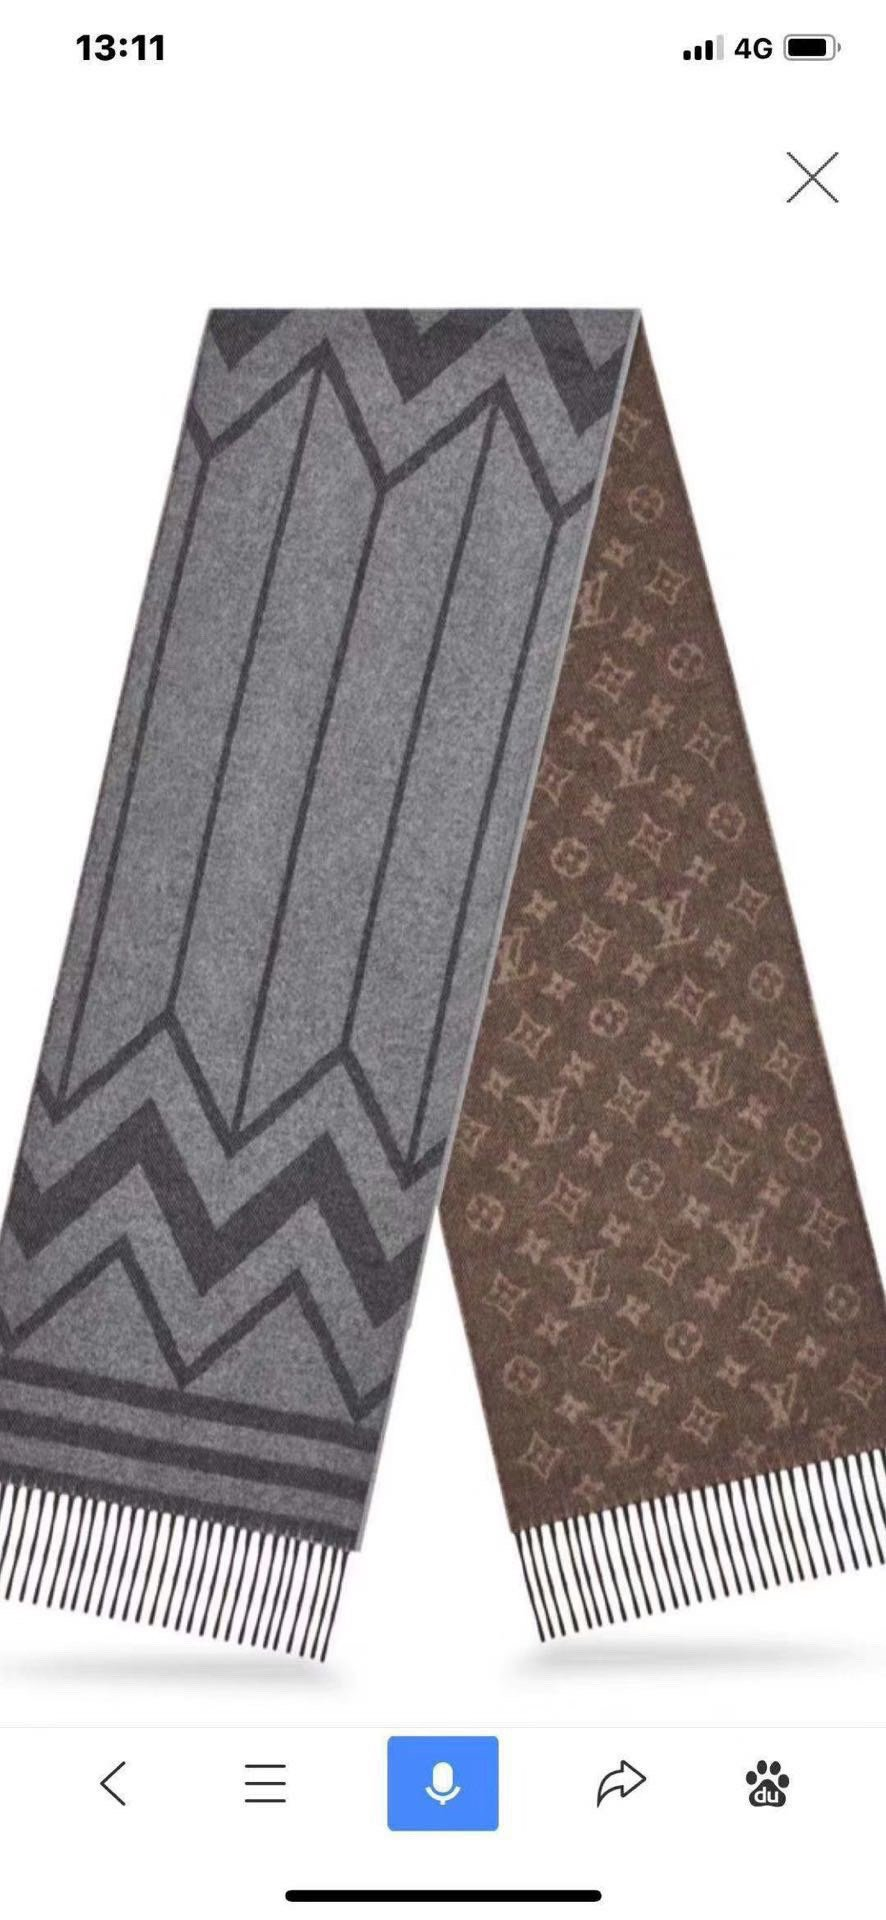 Lv男女通用经典提花围巾依旧是专柜选